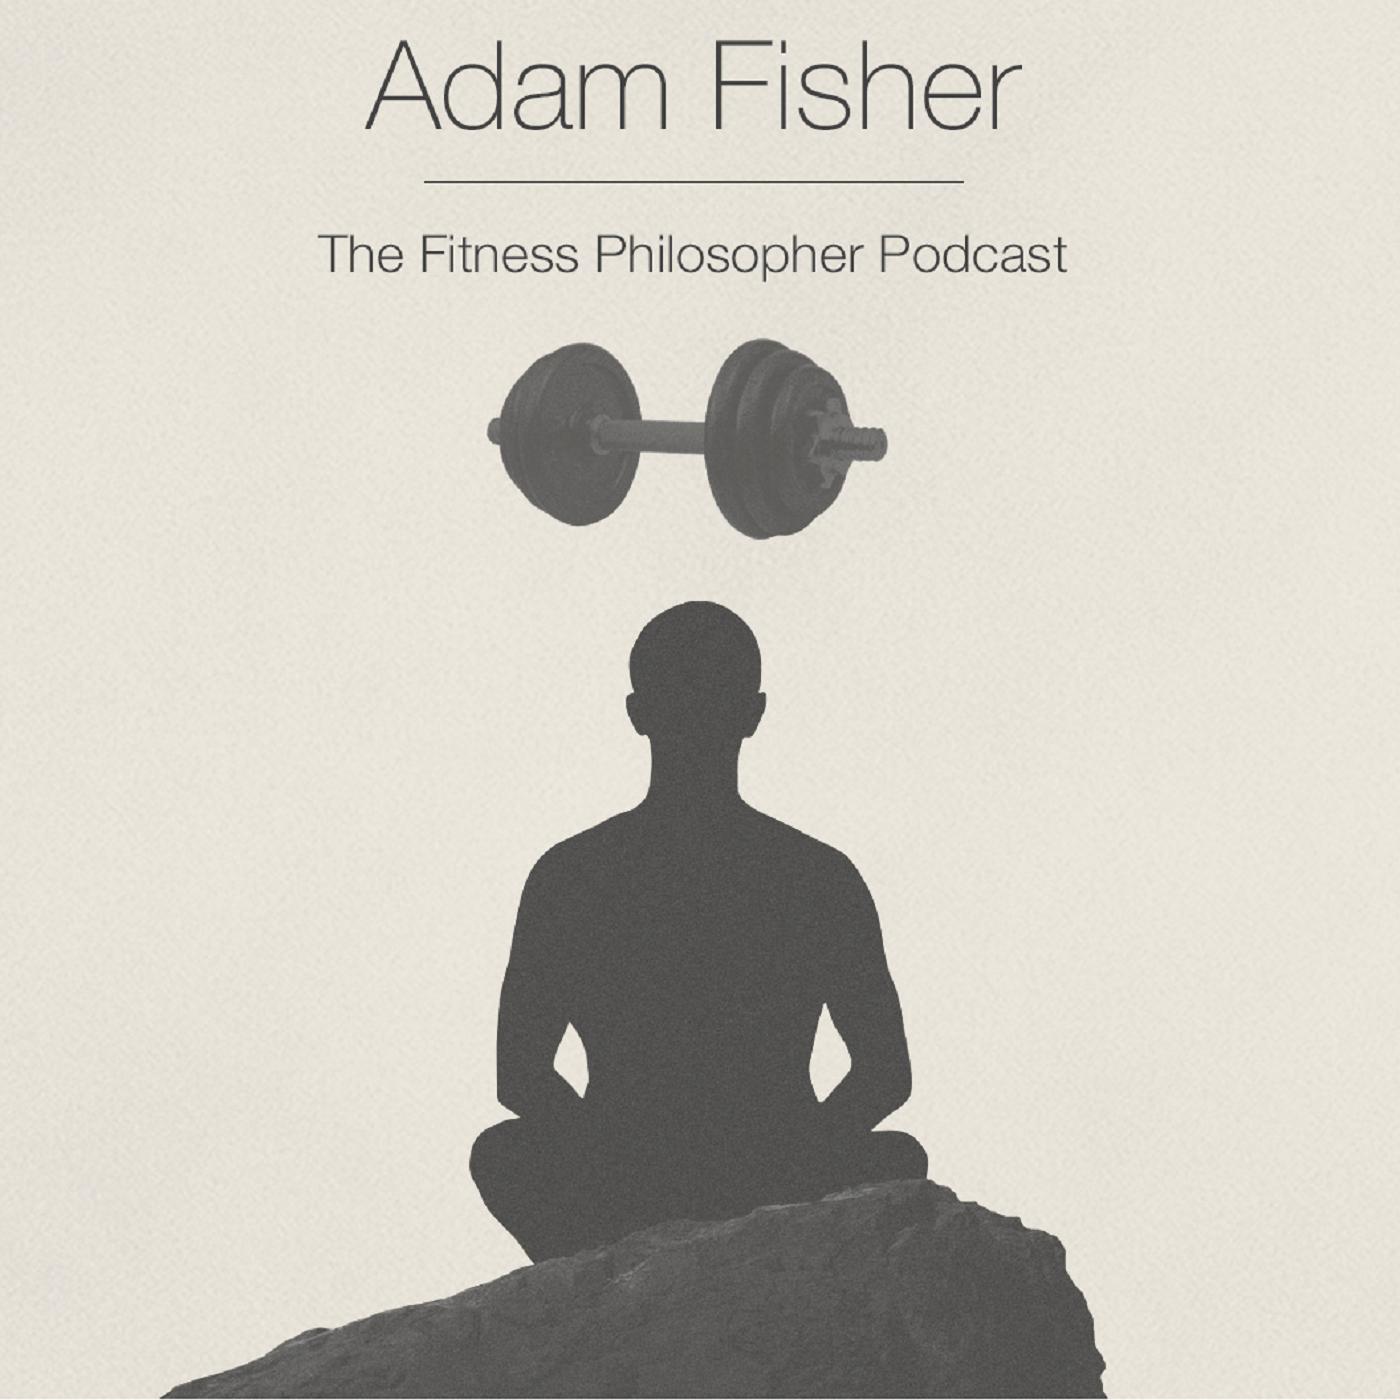 Fitness Philosopher Podcast